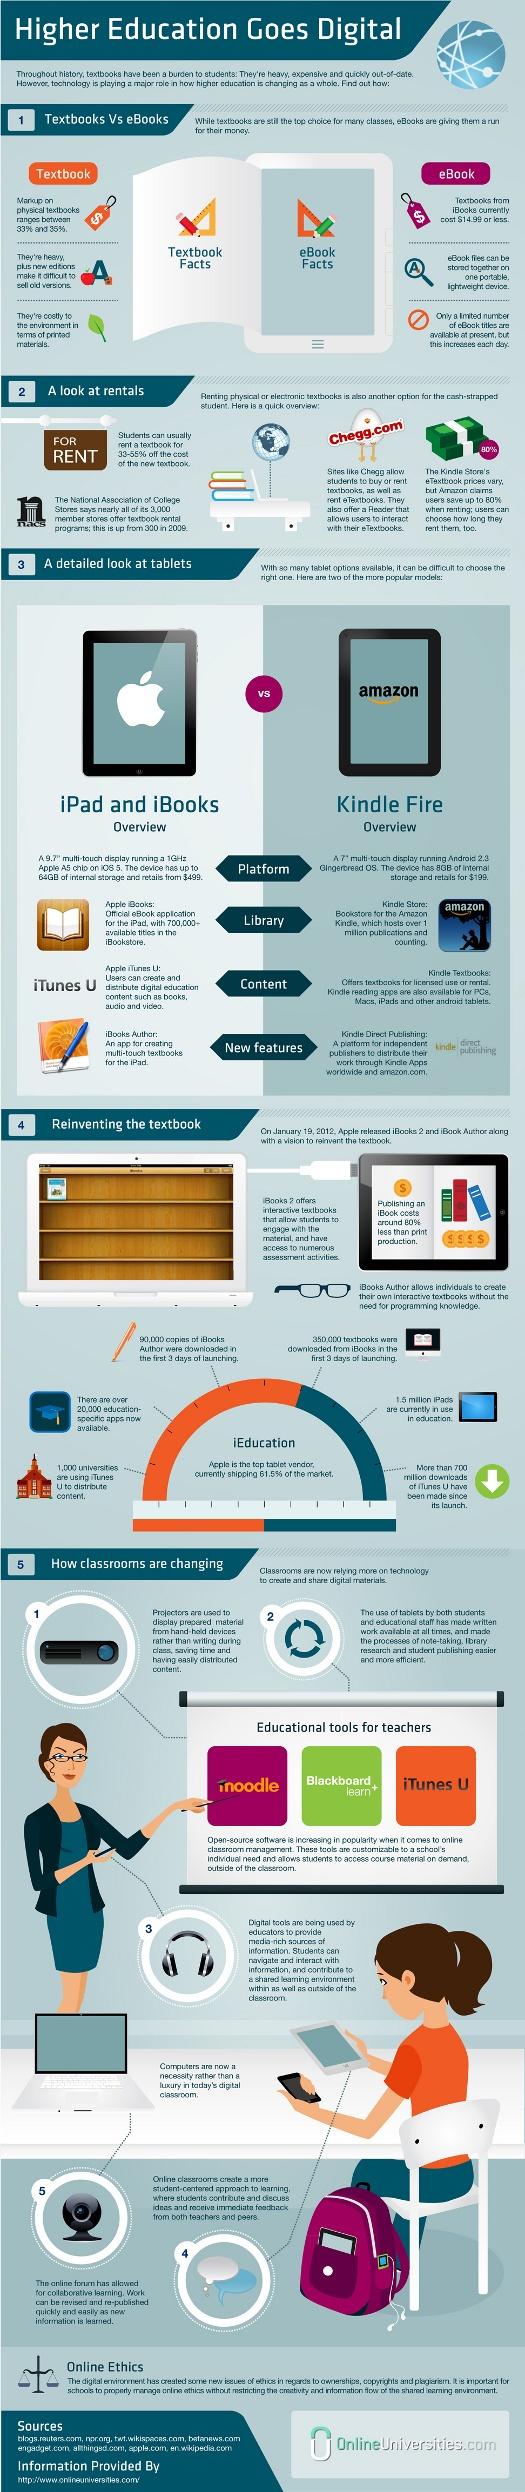 Bildung wird digital [Infografik] - entwickler.com